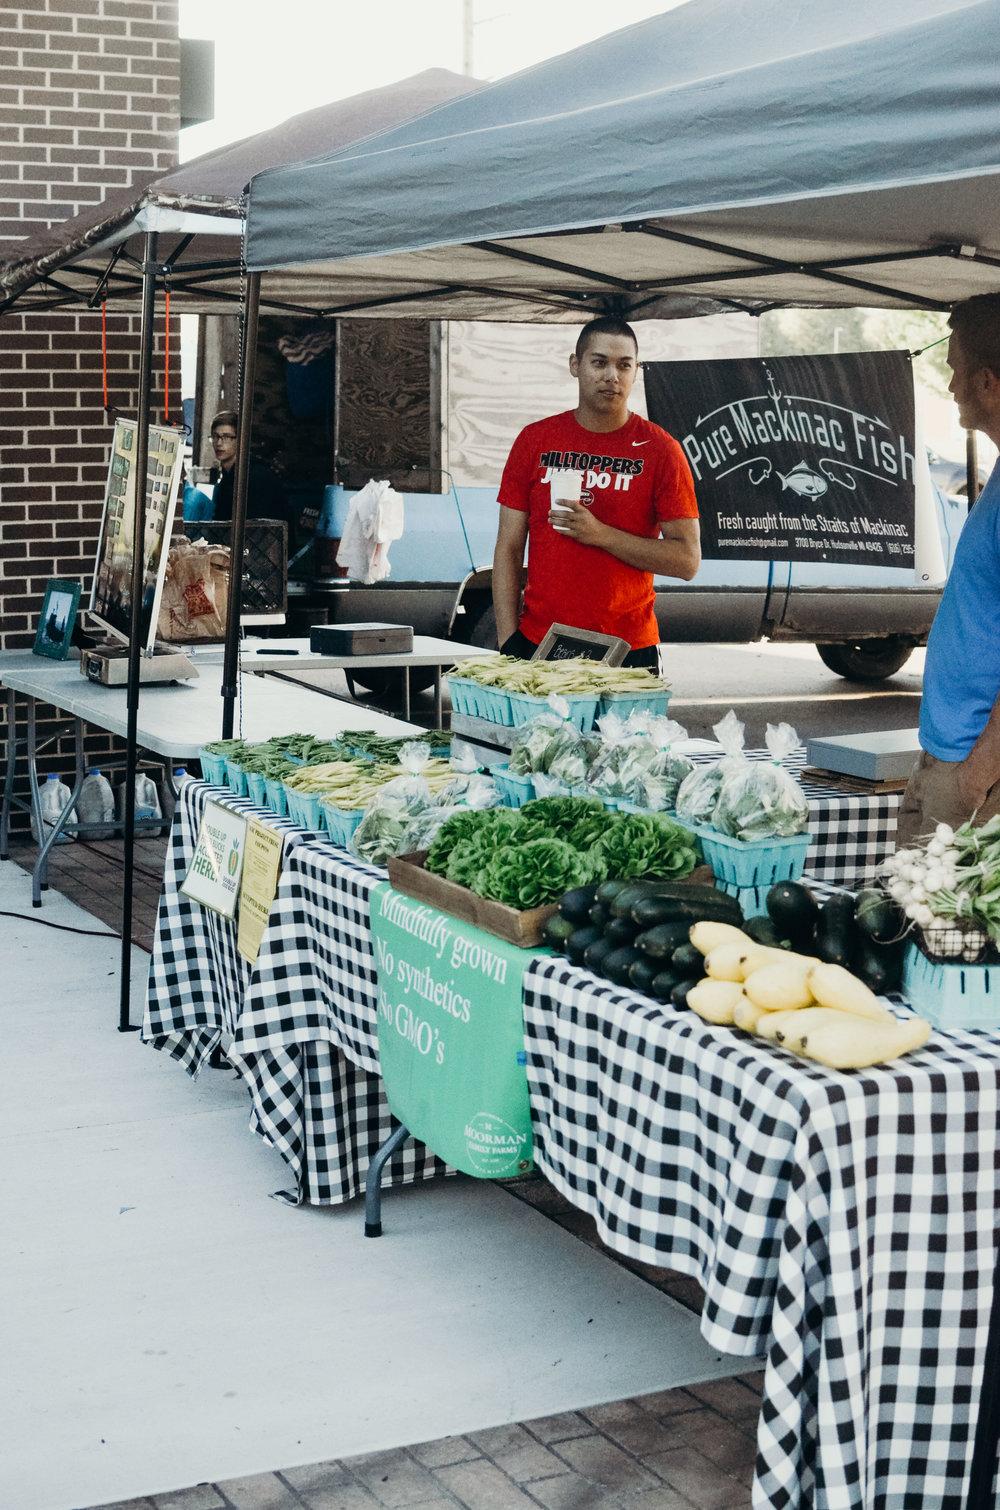 Wendling_Boyd_Terra_Square_Farmers_Market-17.jpg